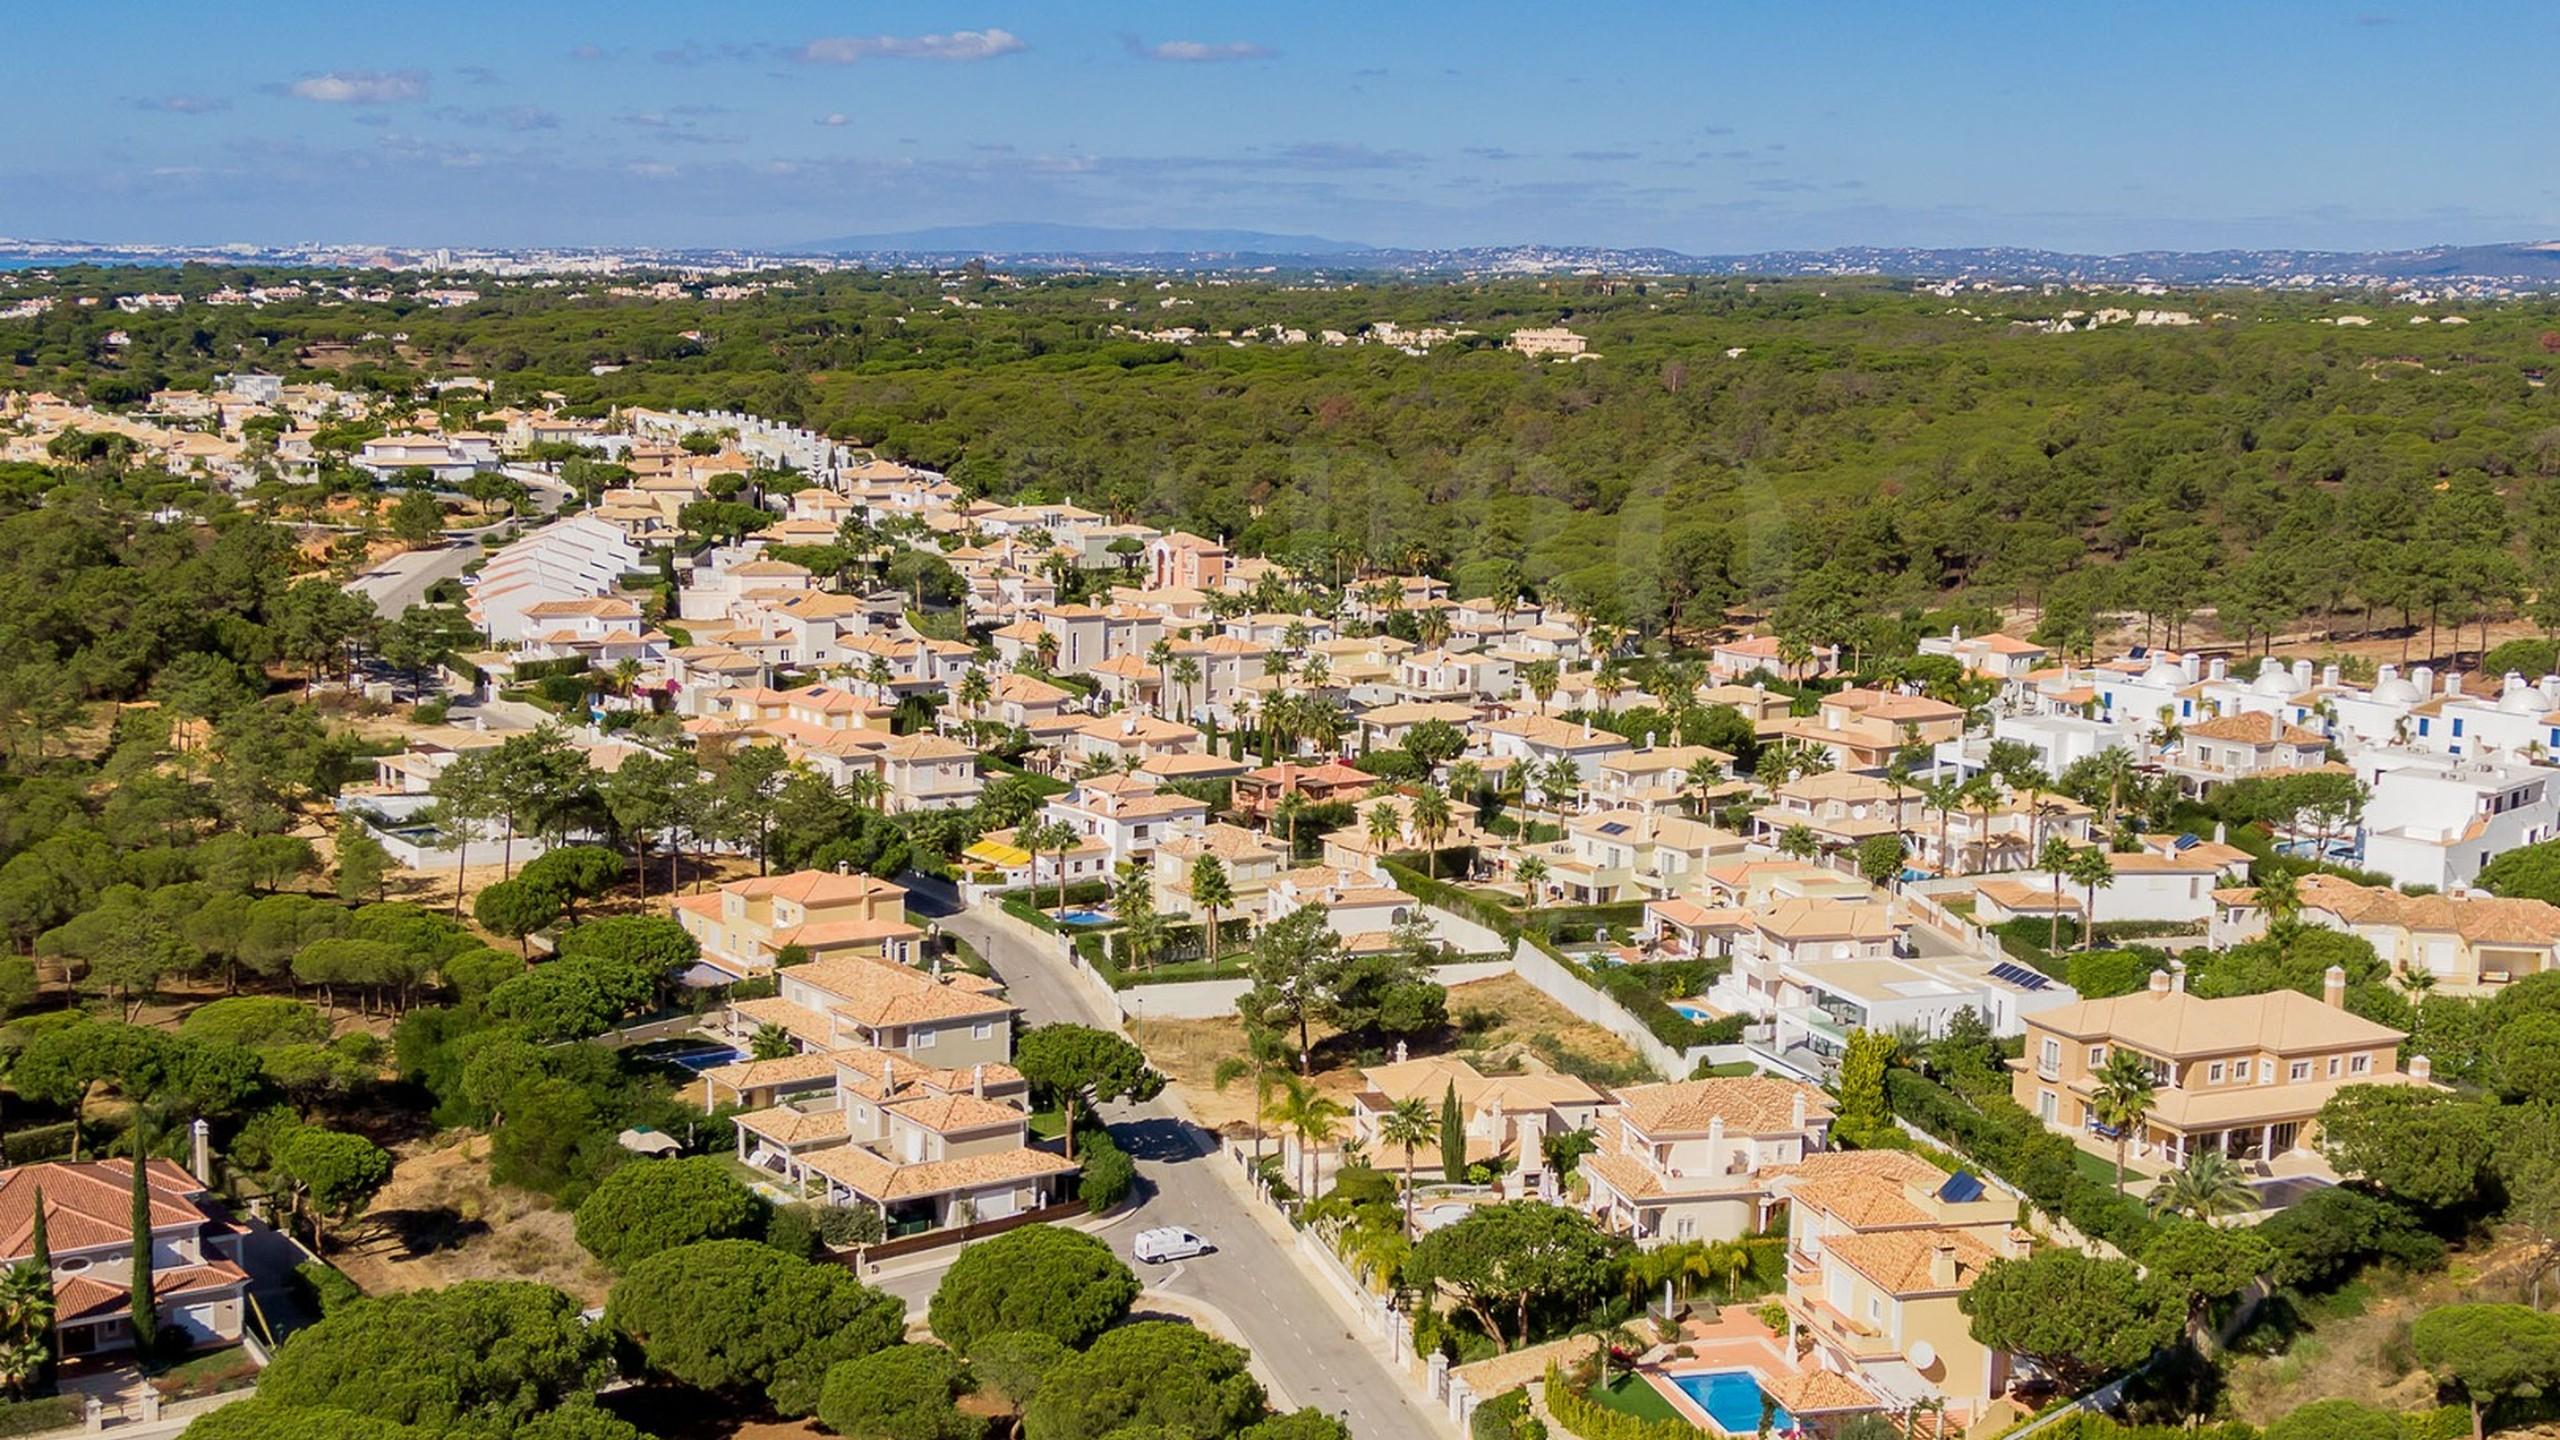 Plot for sale close to the beach in Algarve, Portugal